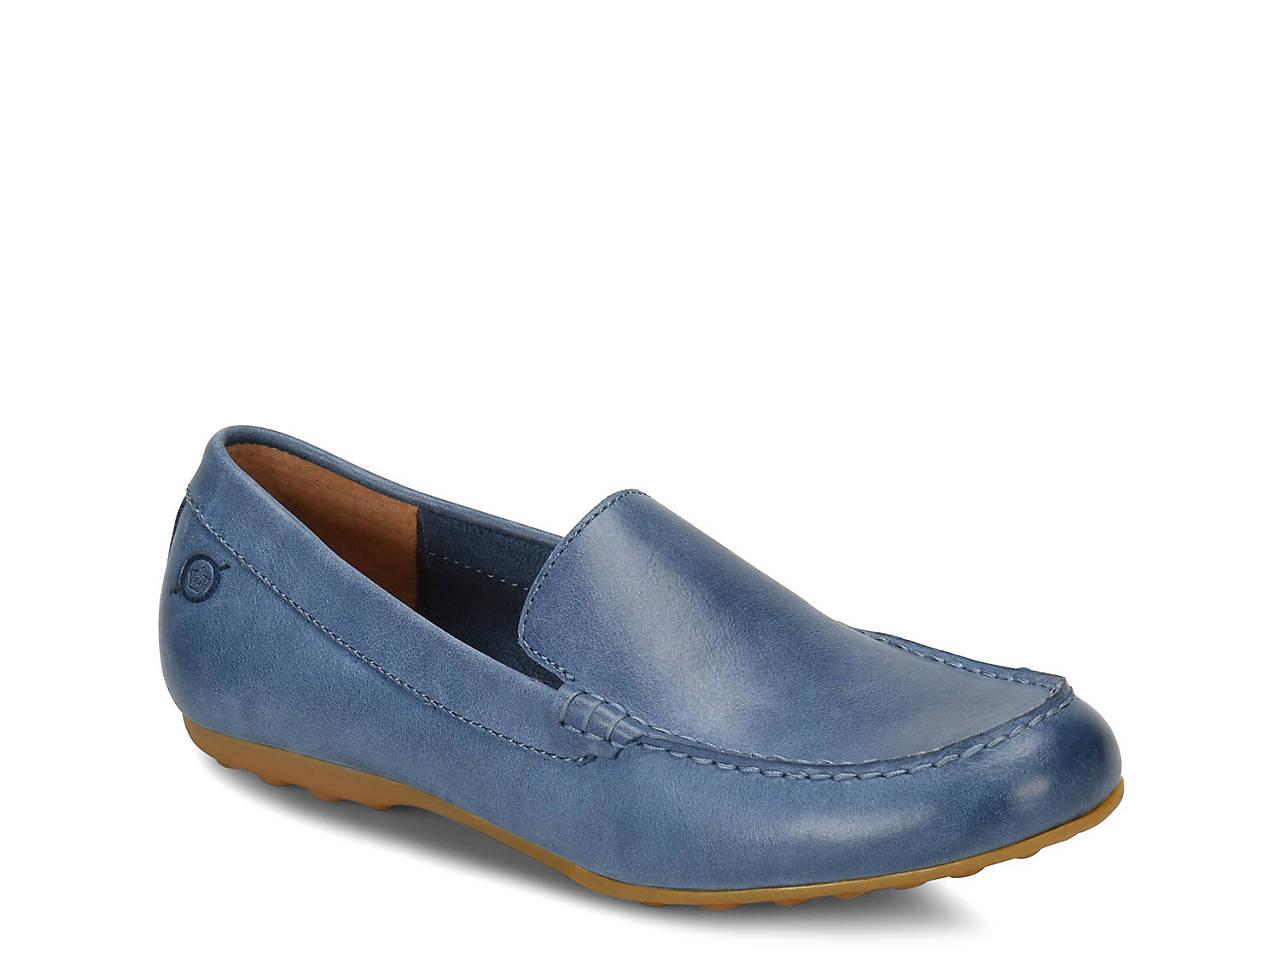 628556bd32c8 Born Aileen Slip-On Women s Shoes